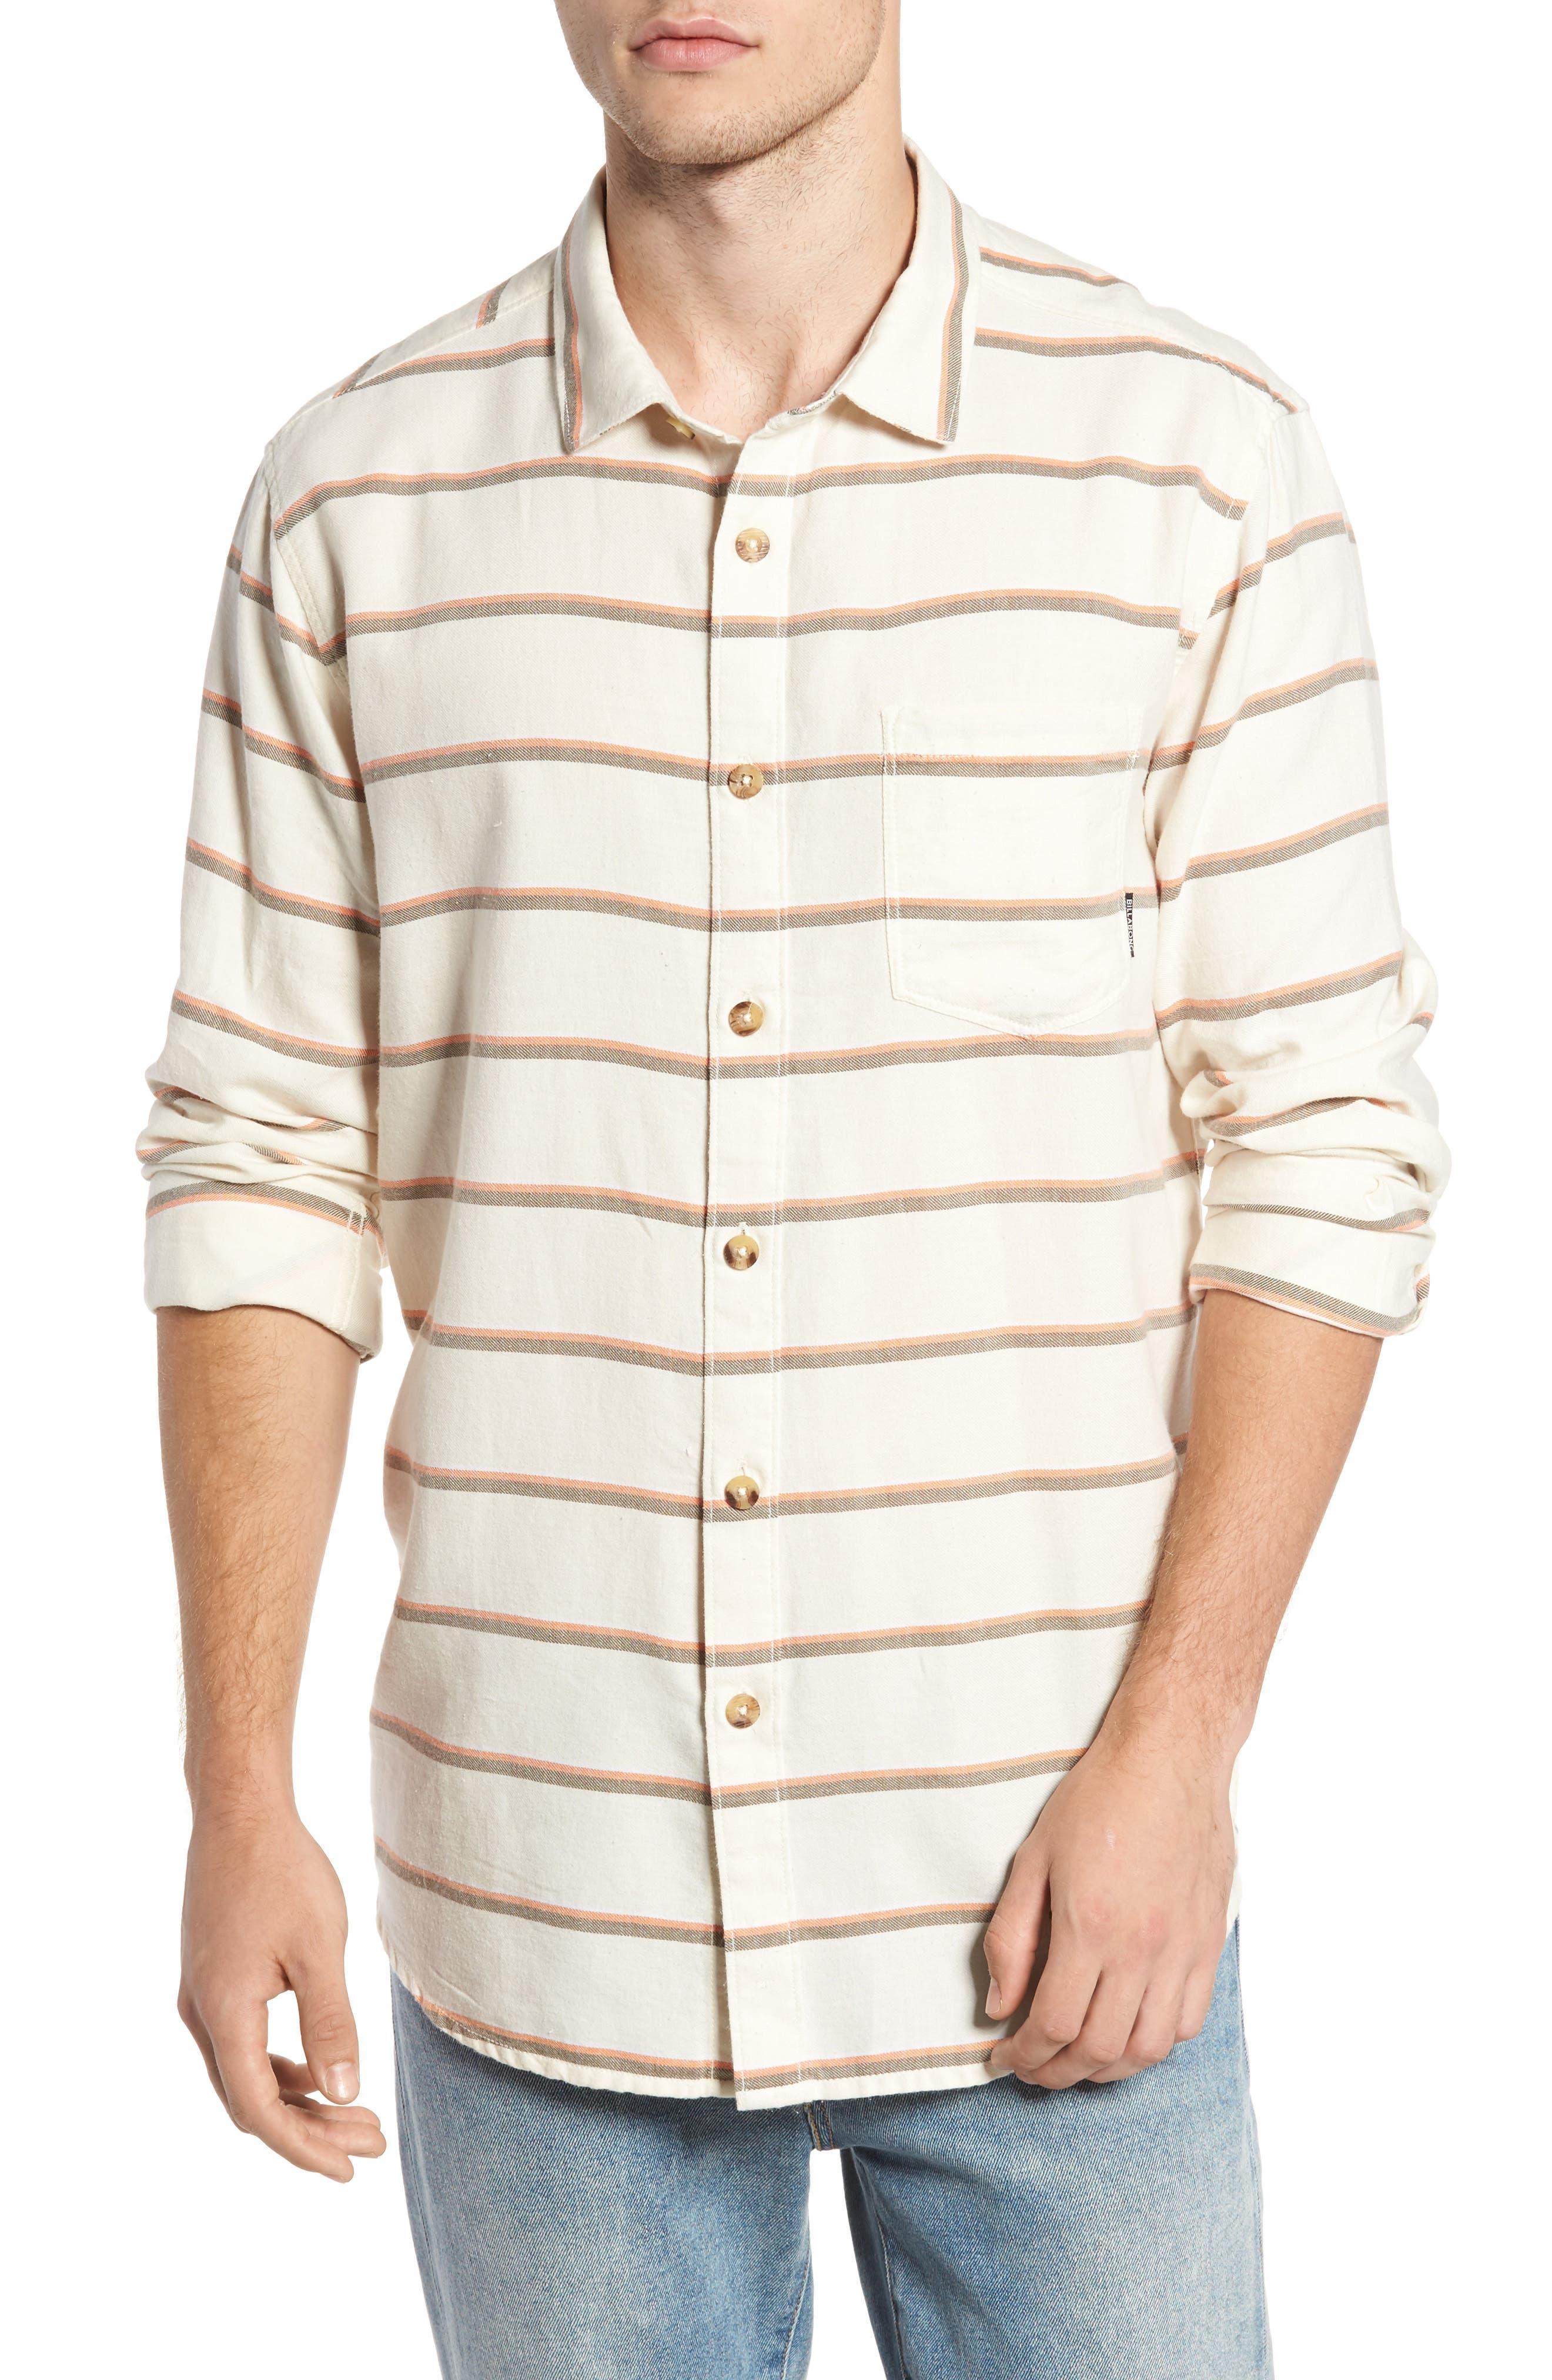 Alternate Image 1 Selected - Billabong Freemont Flannel Shirt